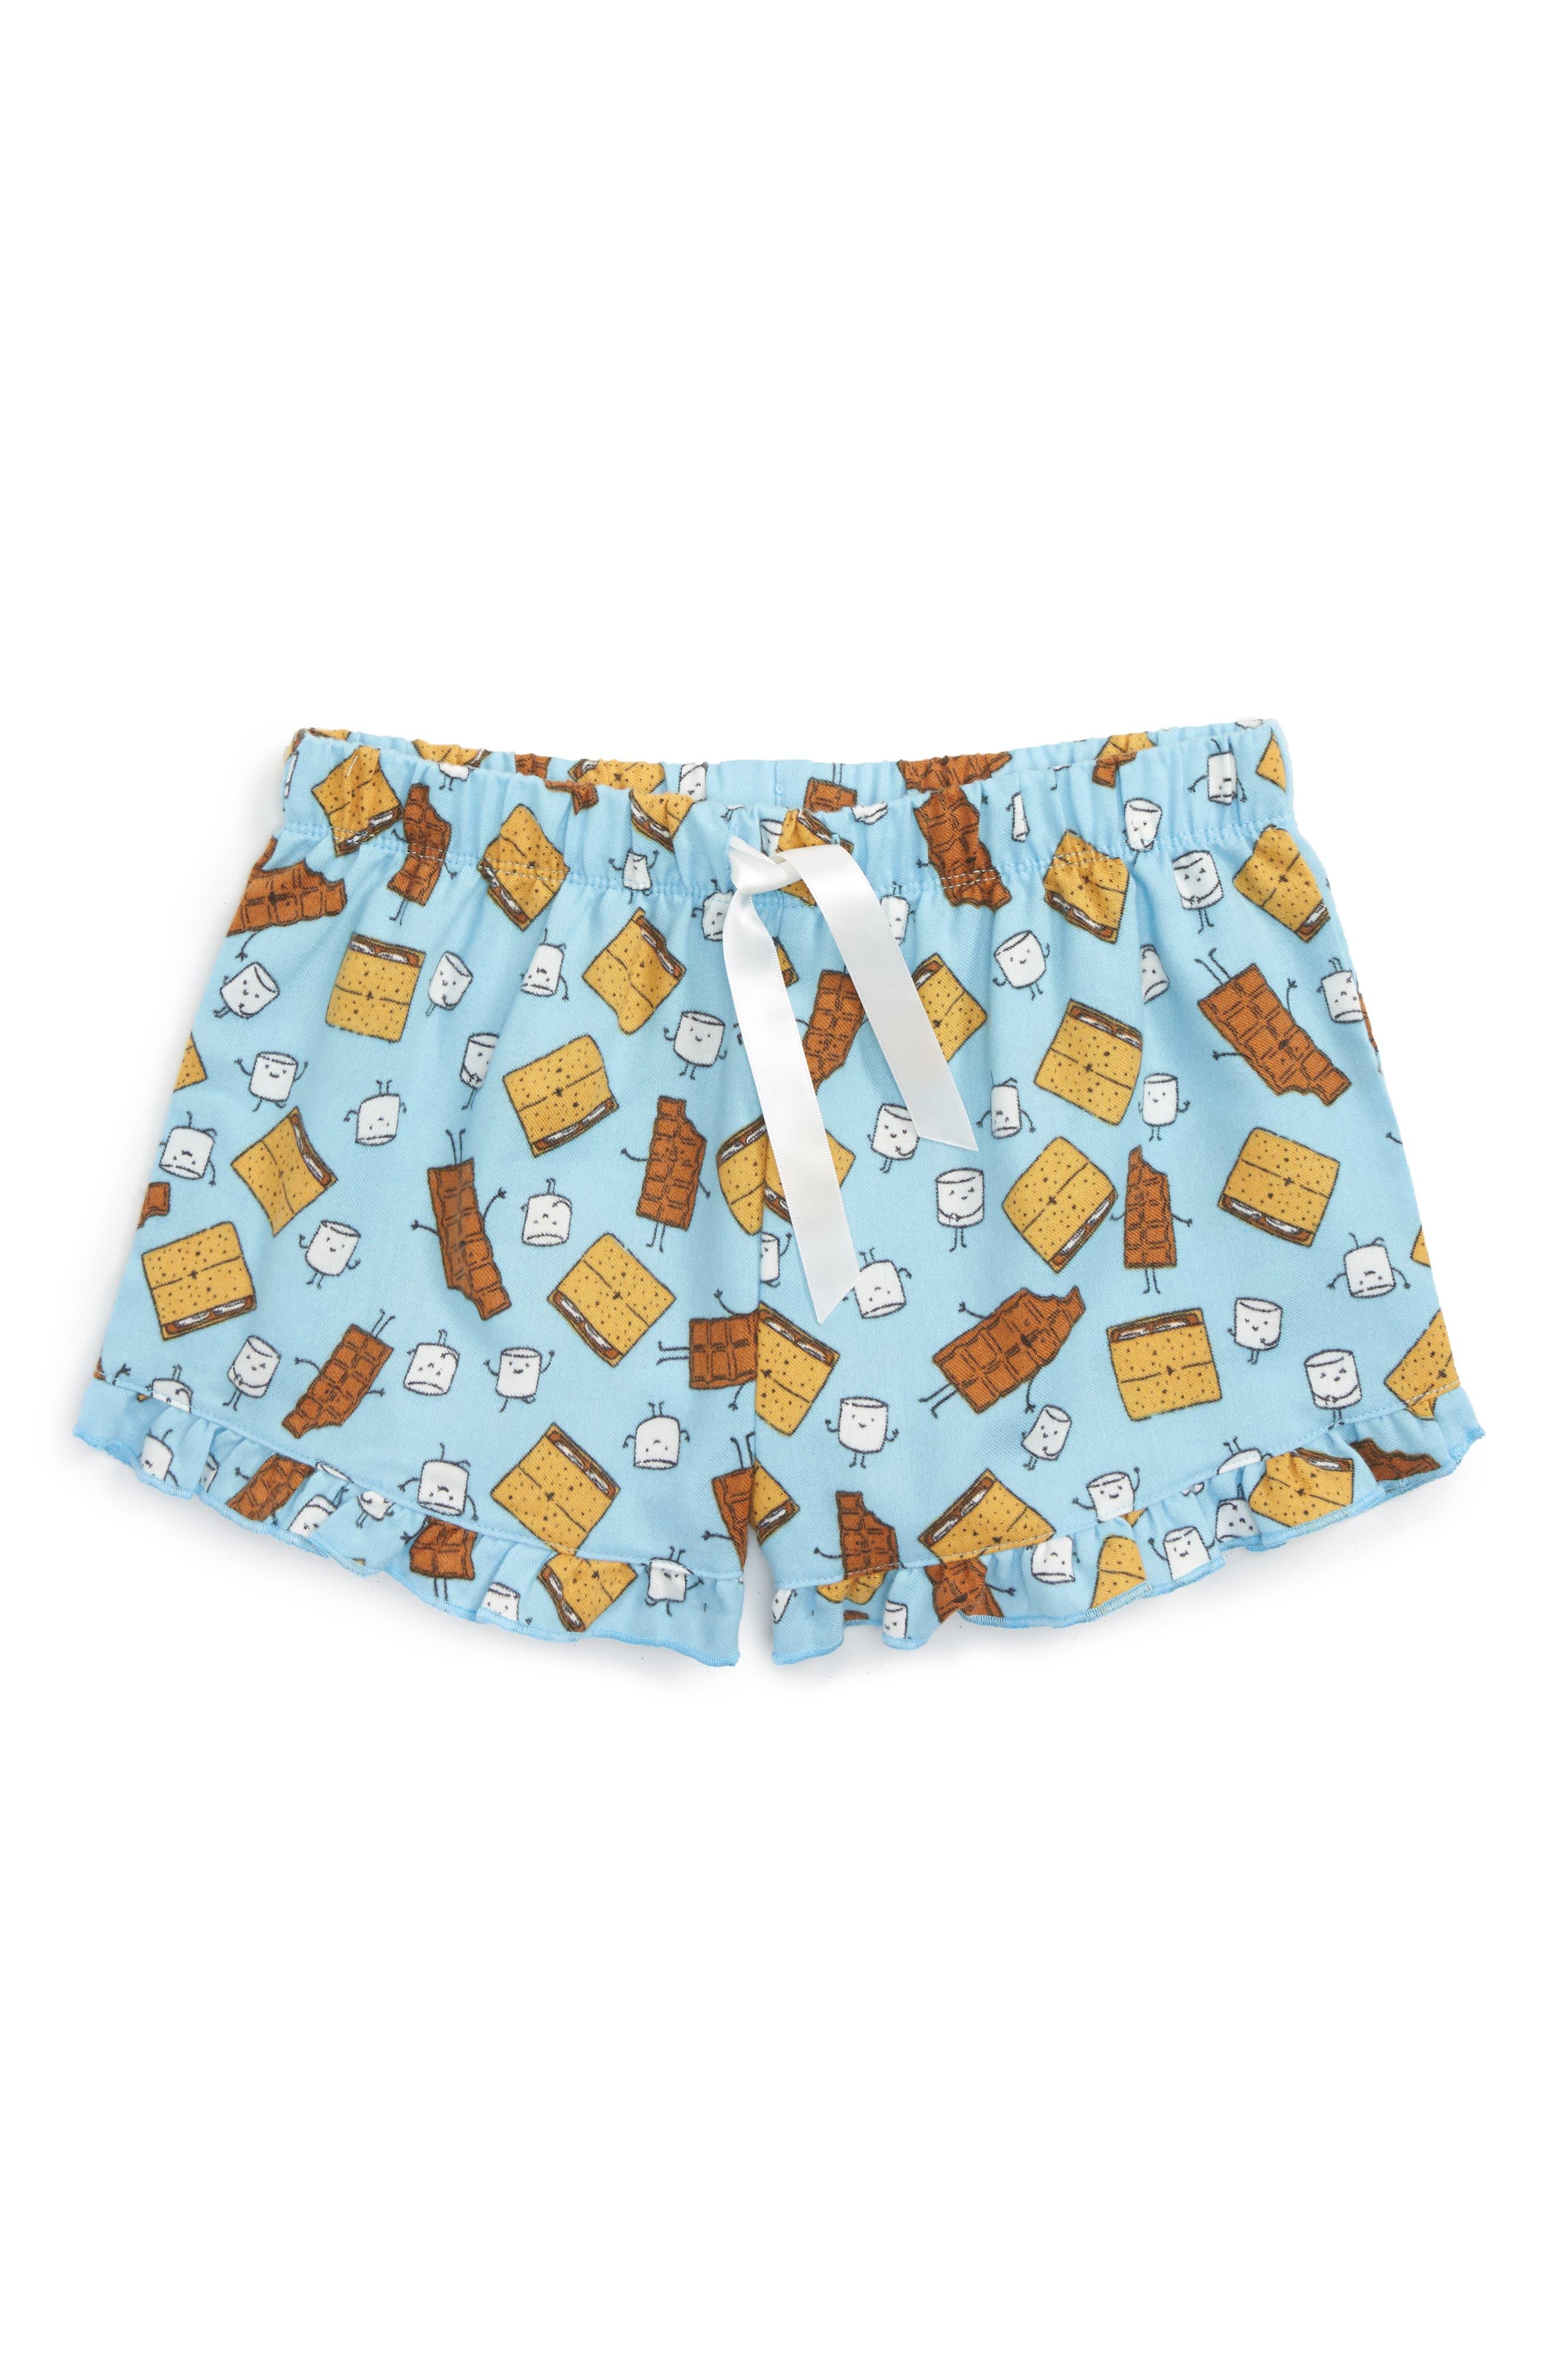 Alternate Image 1 Selected - Tucker + Tate Flannel Shorts (Big Girls)